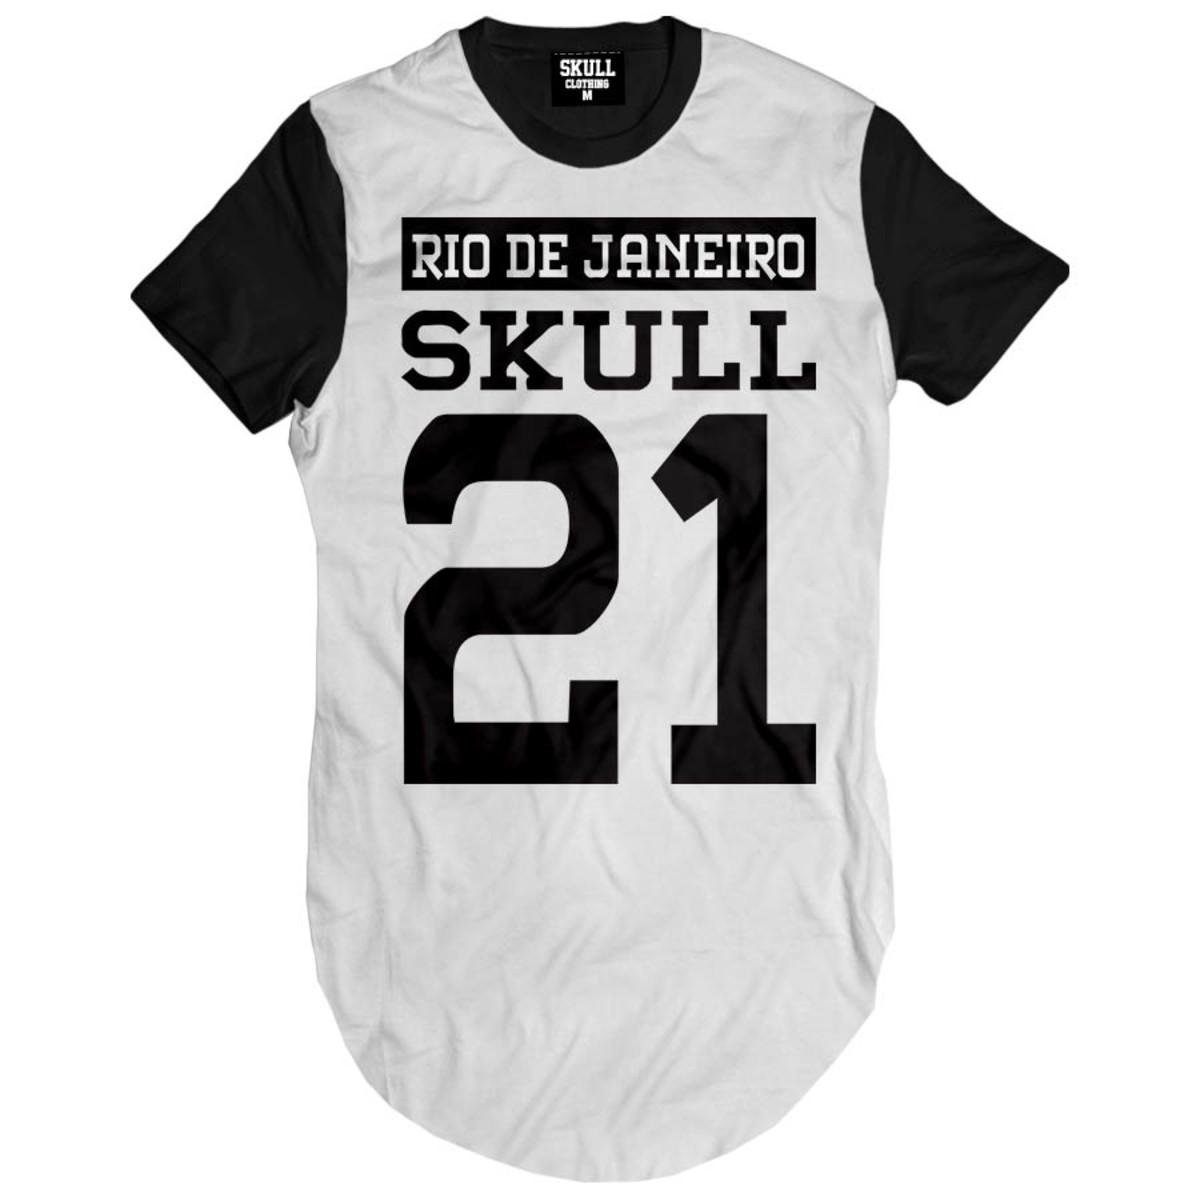 74c31ed6f3 Zoom · Camiseta Longa Rj Skull Hip Hop camisa masculina alongada